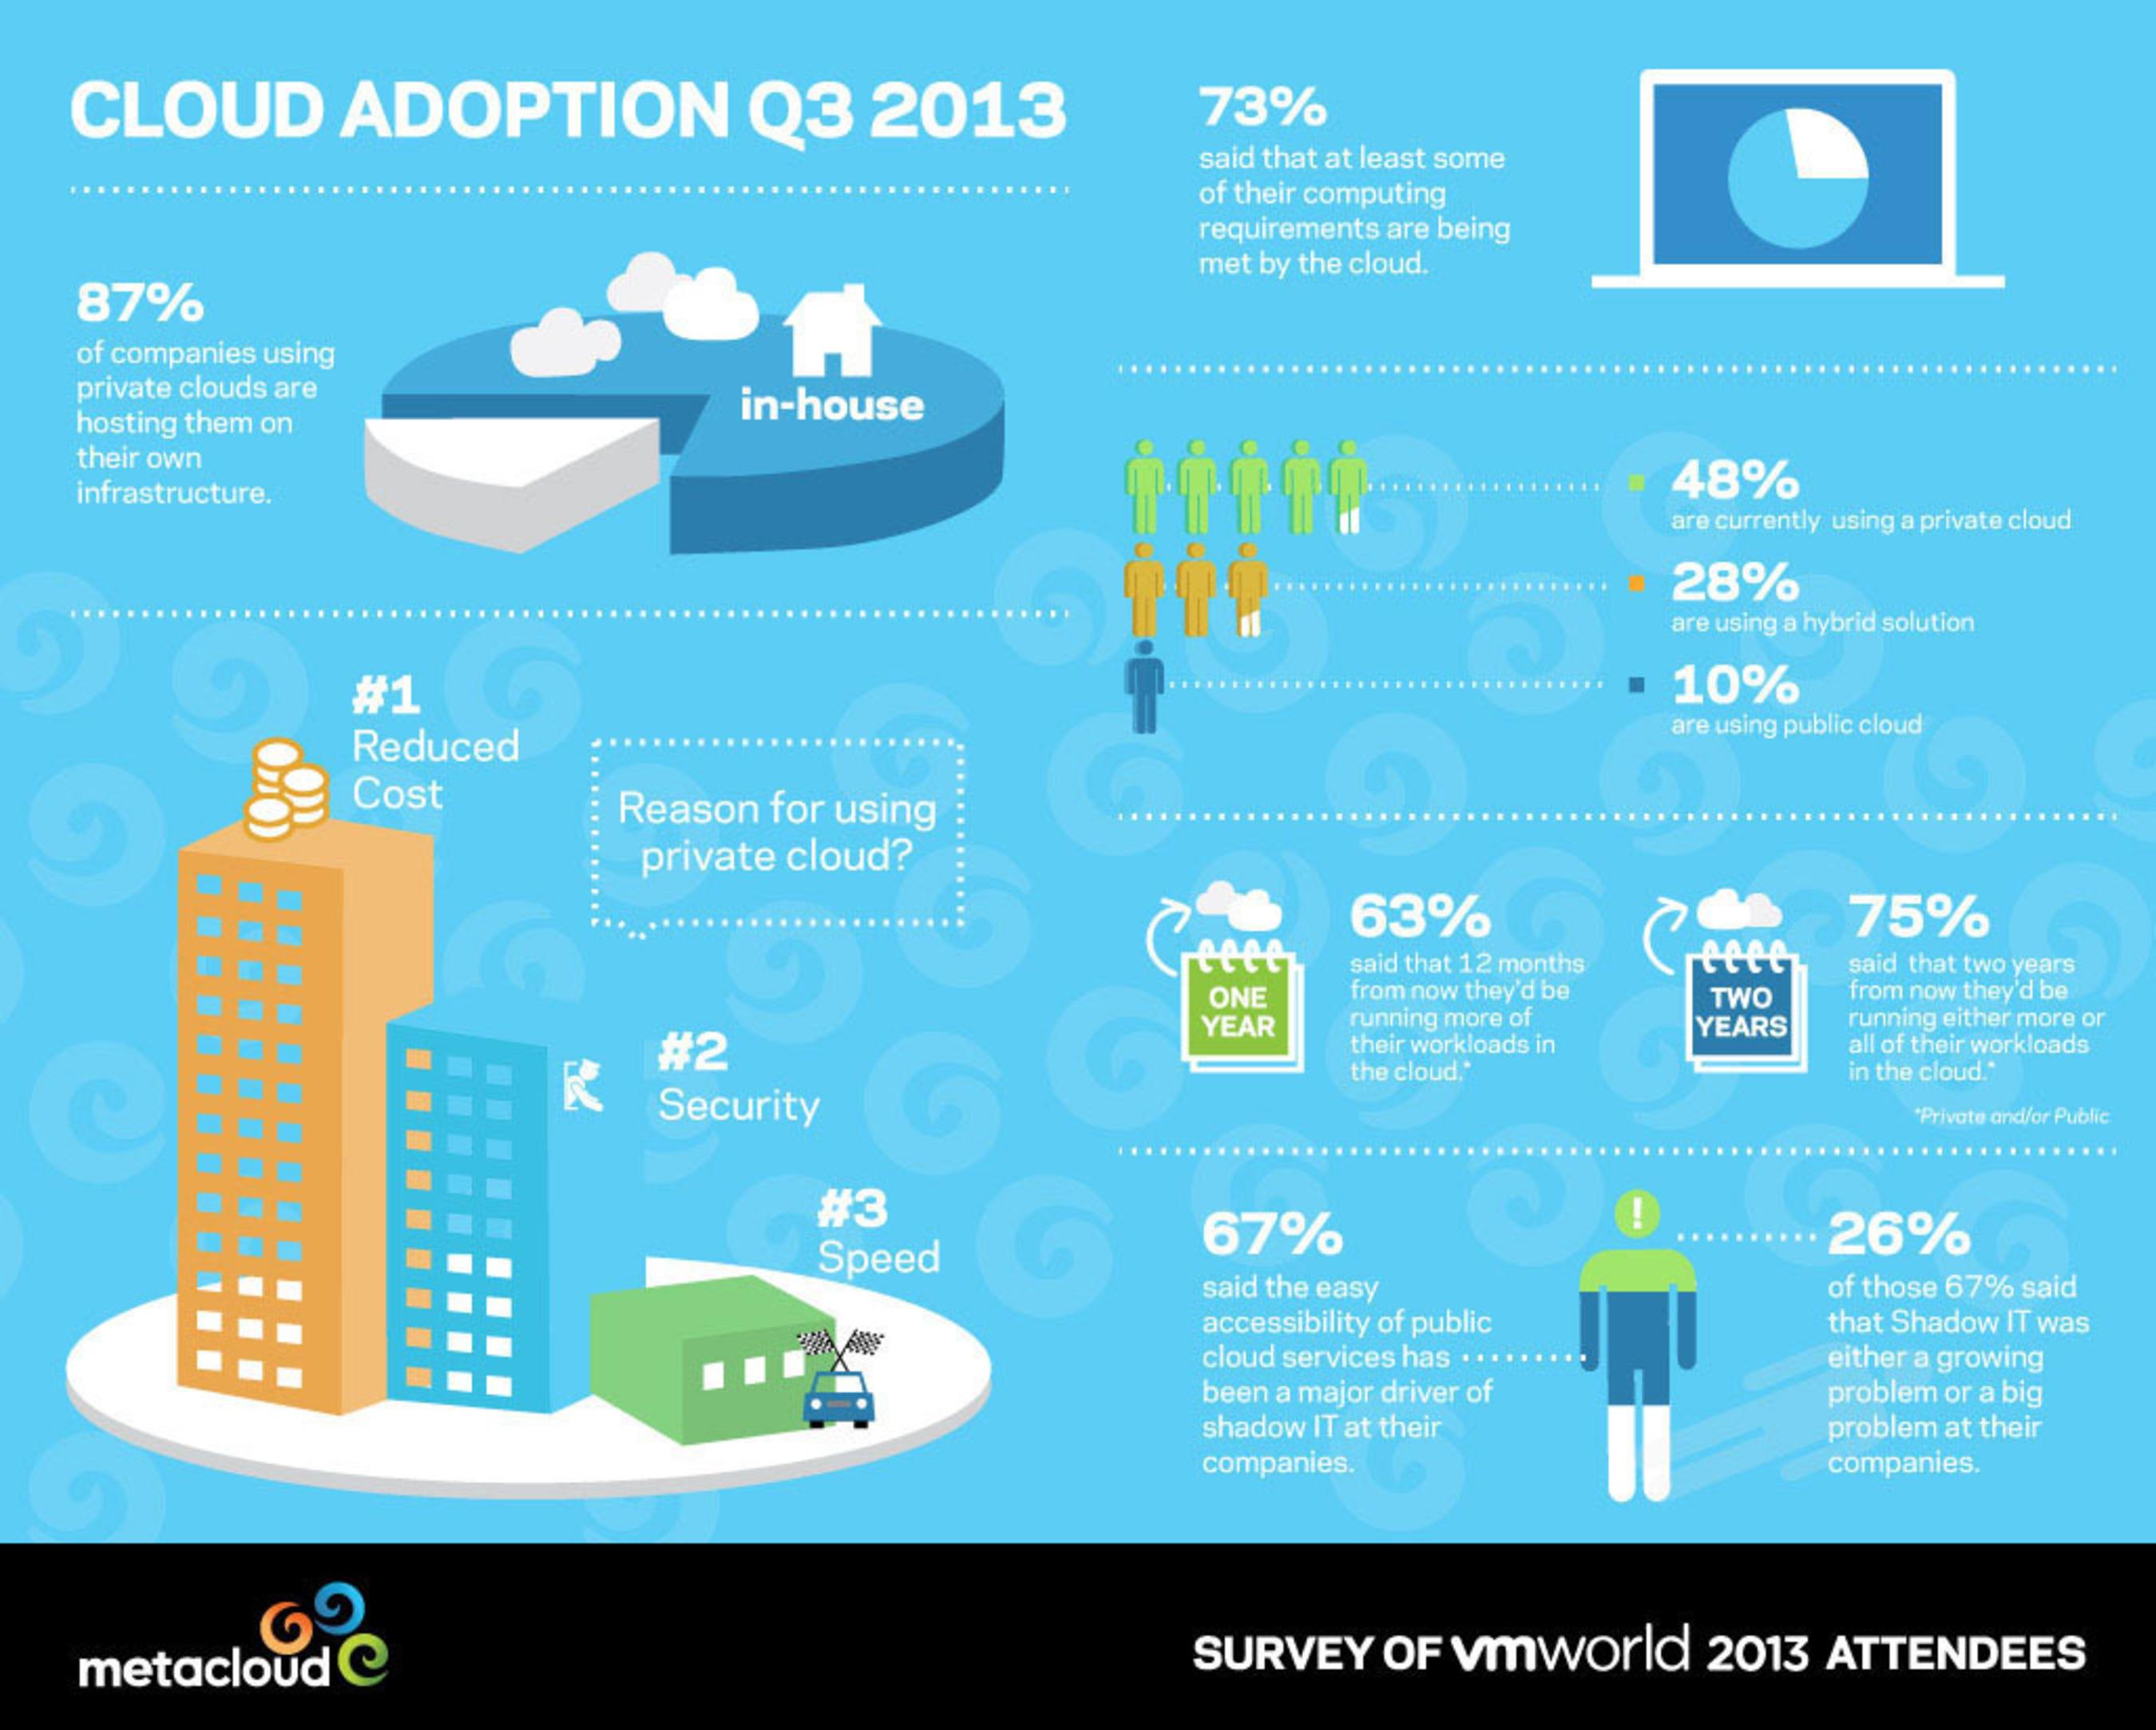 VMworld survey sponsored by Metacloud Inc: Enterprises overwhelmingly choose on-premises private cloud deployments (www.metacloud.com). (PRNewsFoto/Metacloud, Inc.) (PRNewsFoto/METACLOUD, INC.)